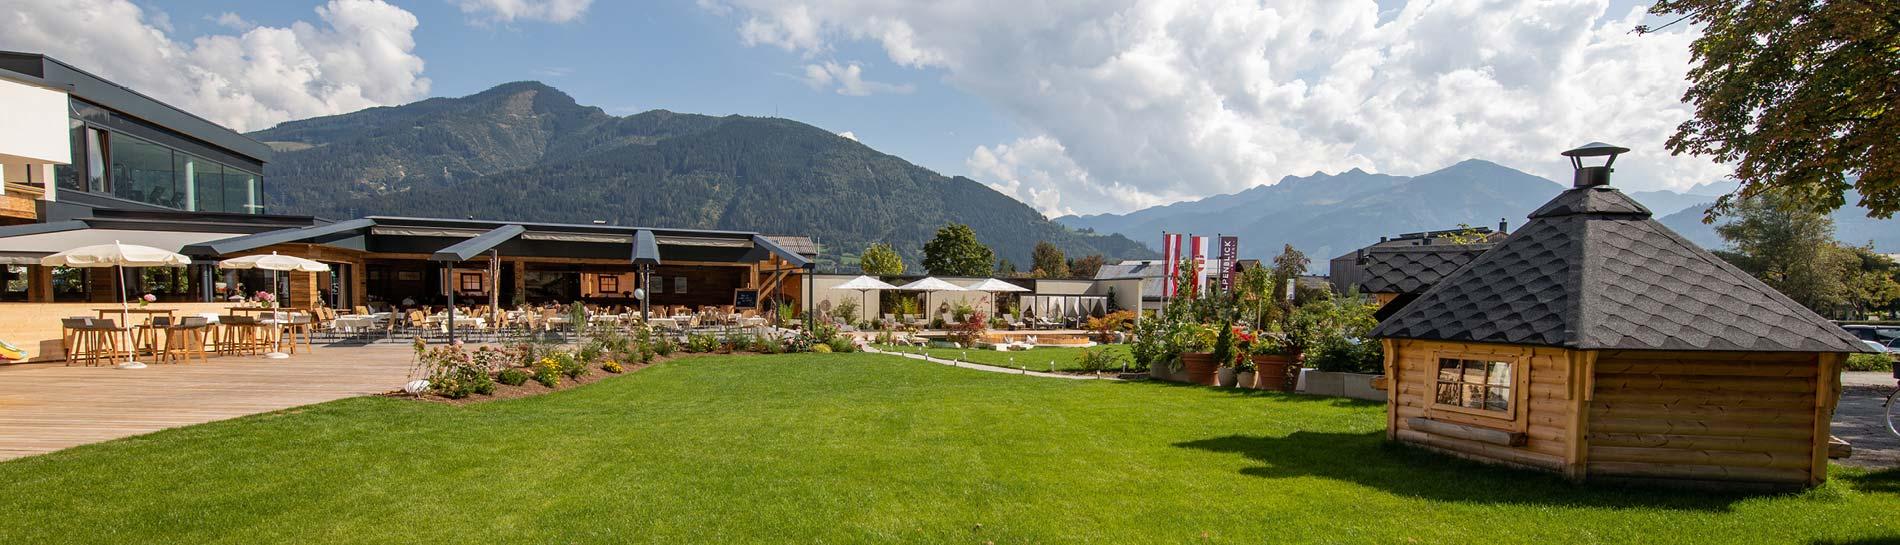 Sportresort Alpenblick Hotel Zell am See Austria Keyfotos Niche Destinations 5